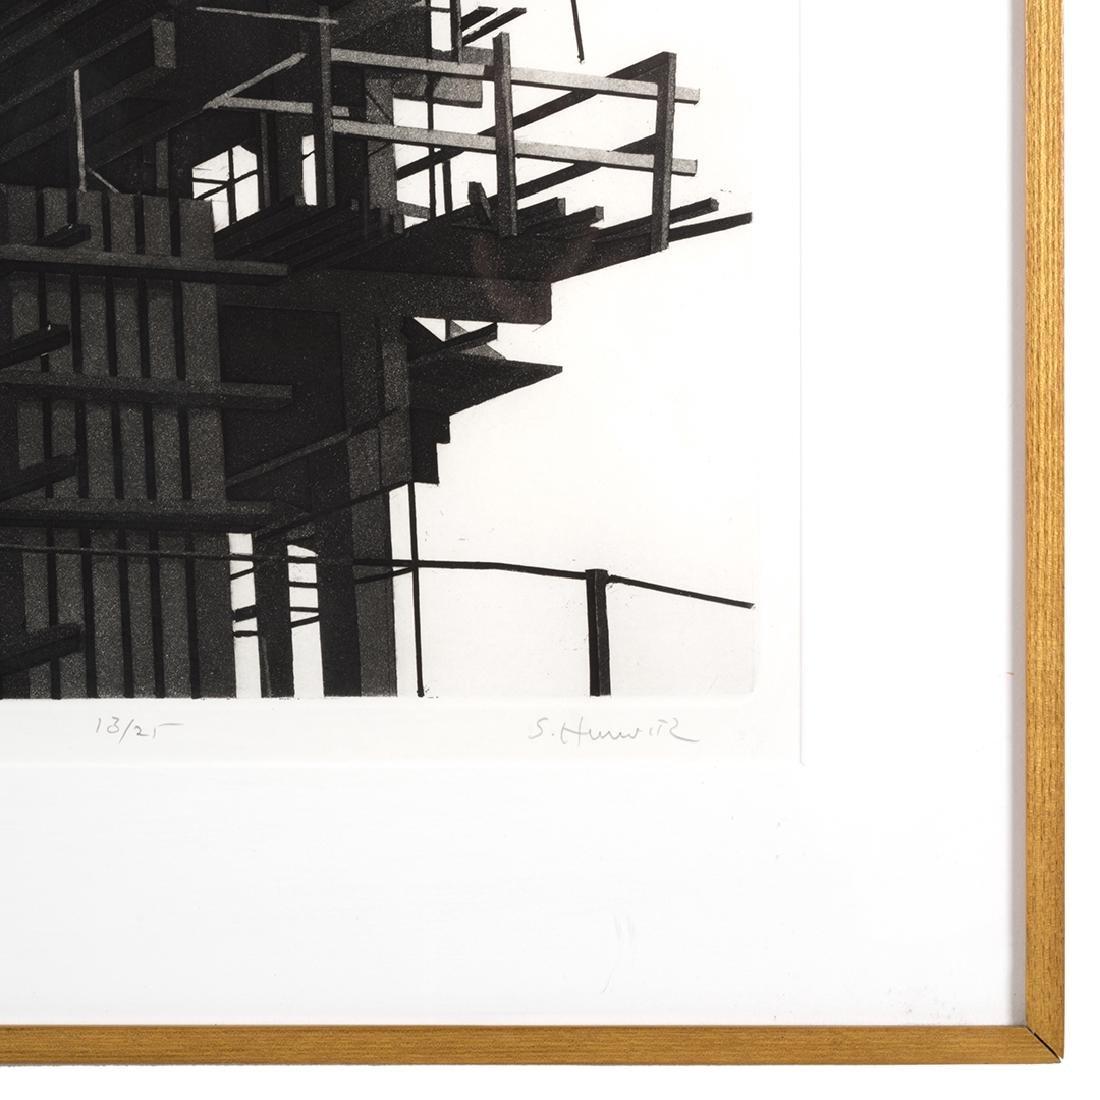 Etching by S. Hurwitz - 2